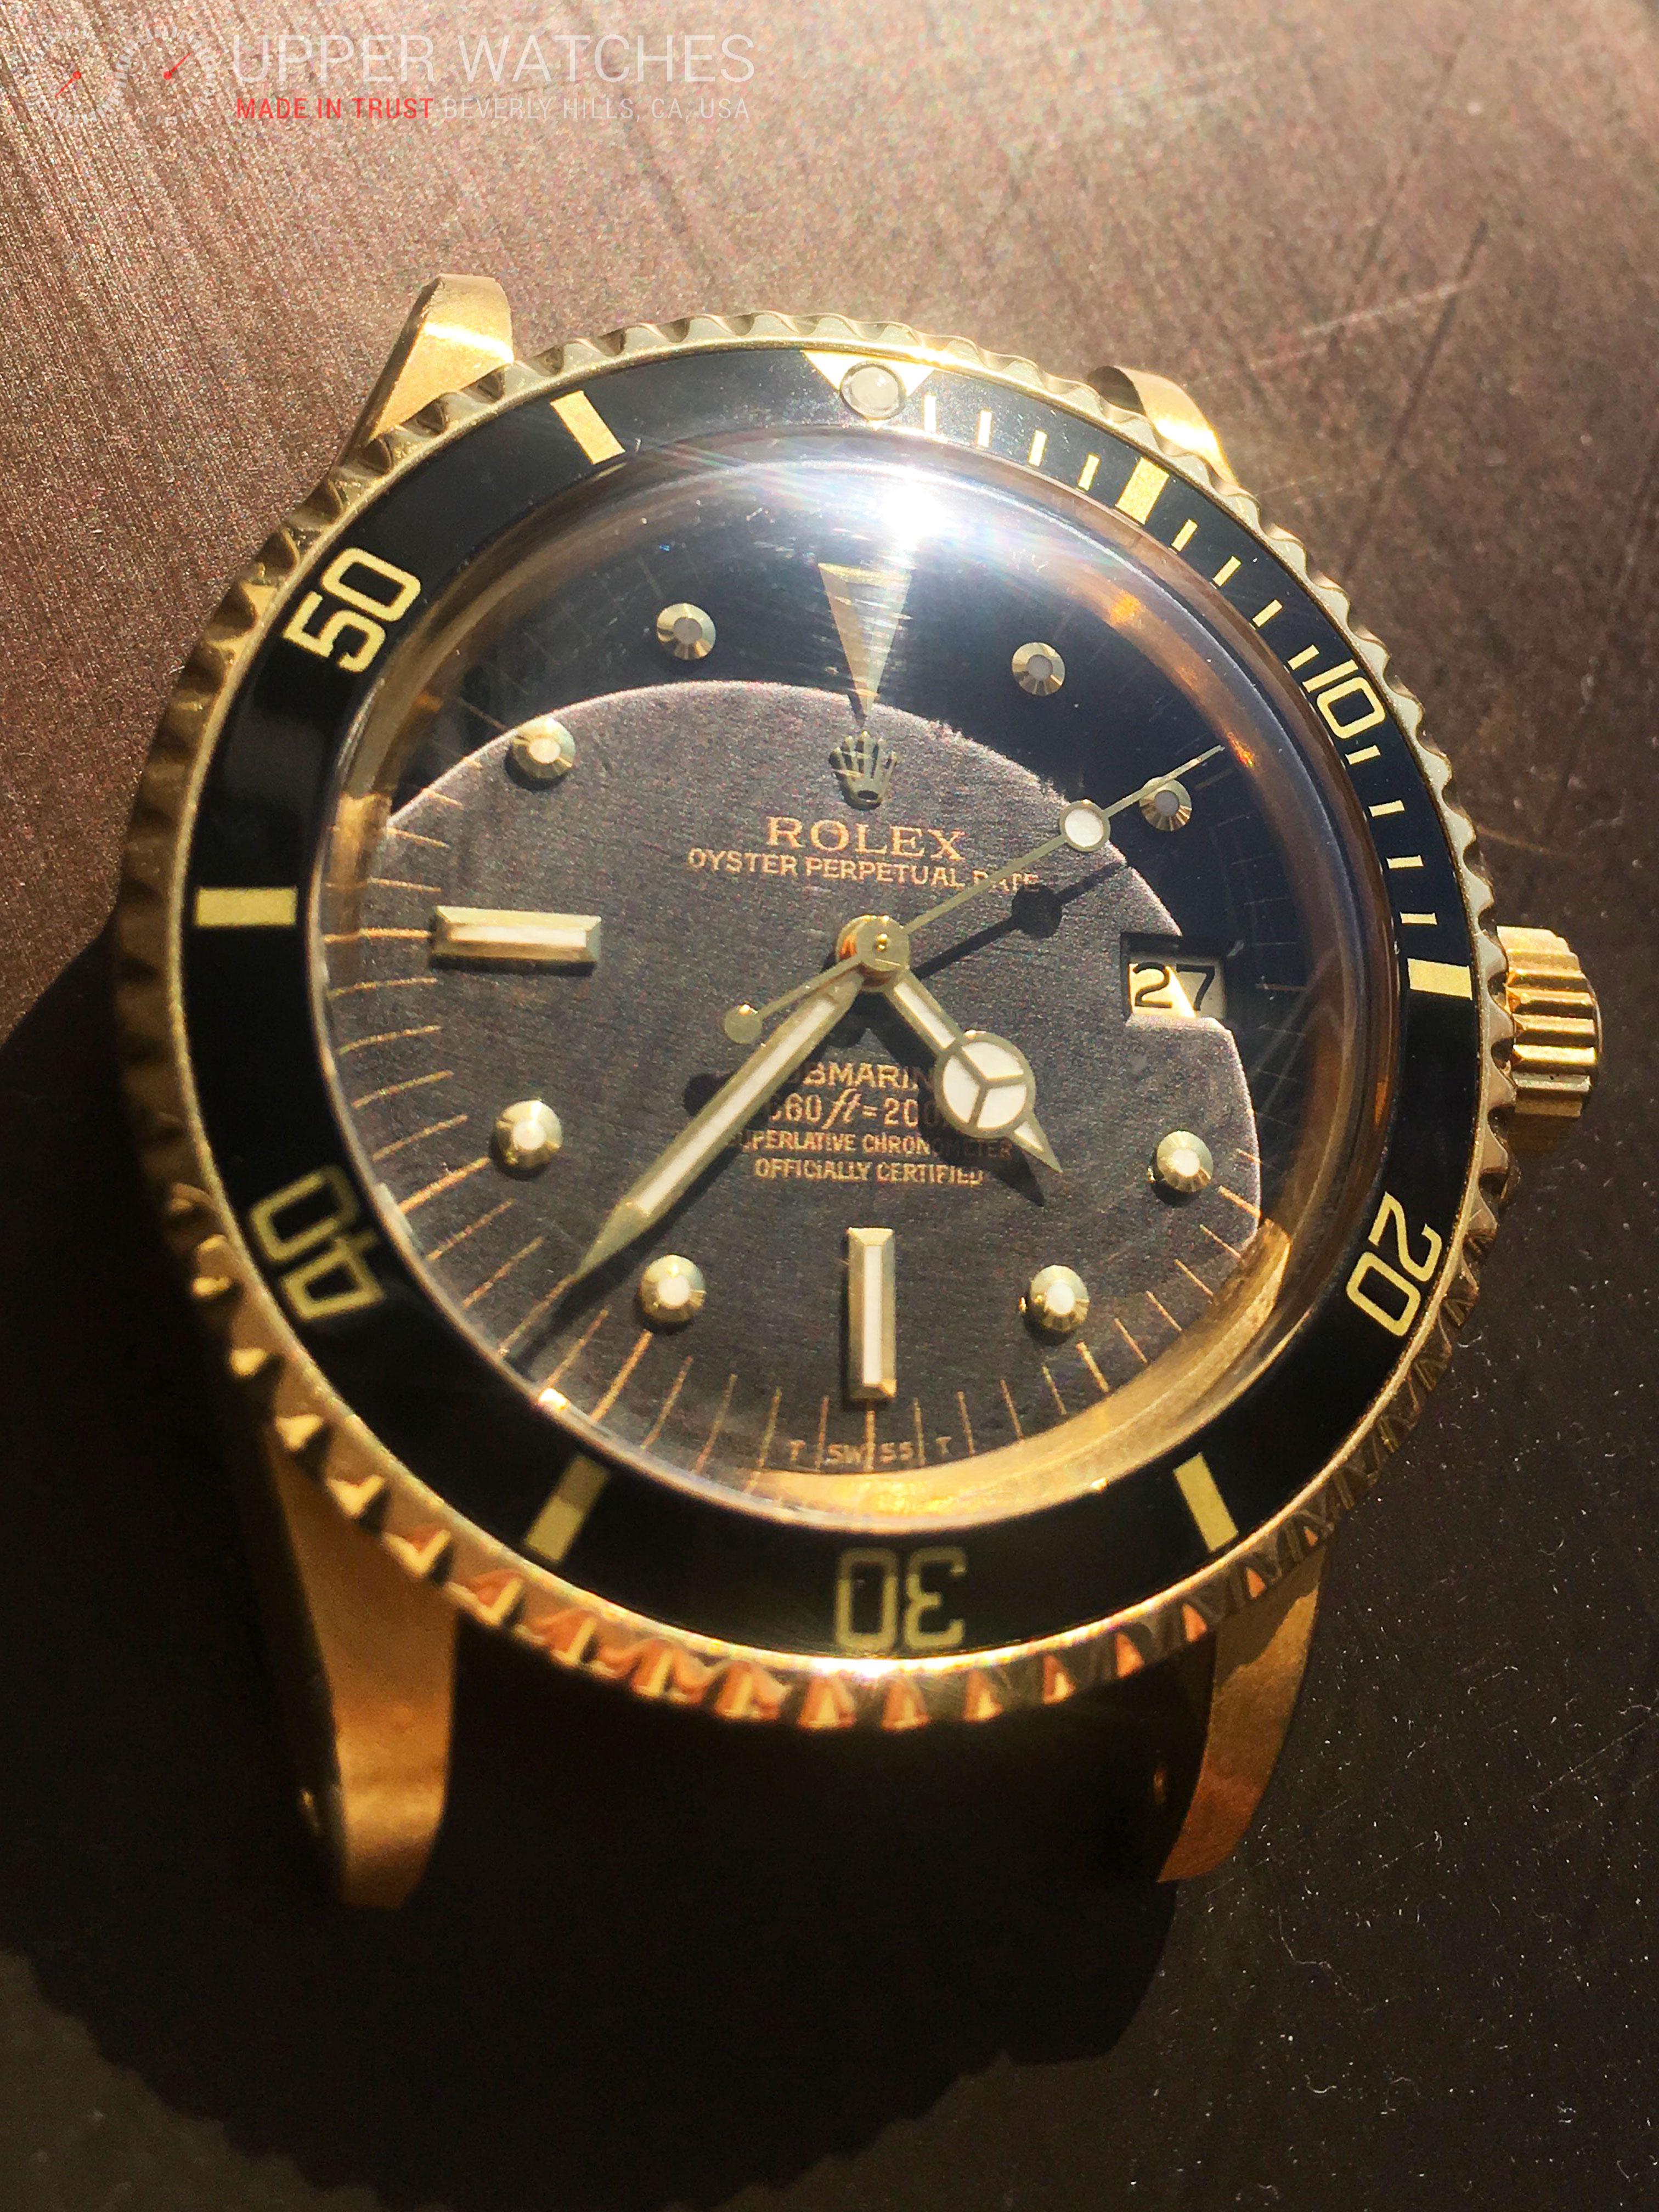 Rolex 1680 Submariner Gilt Black Nipple Dial - Upper Watches